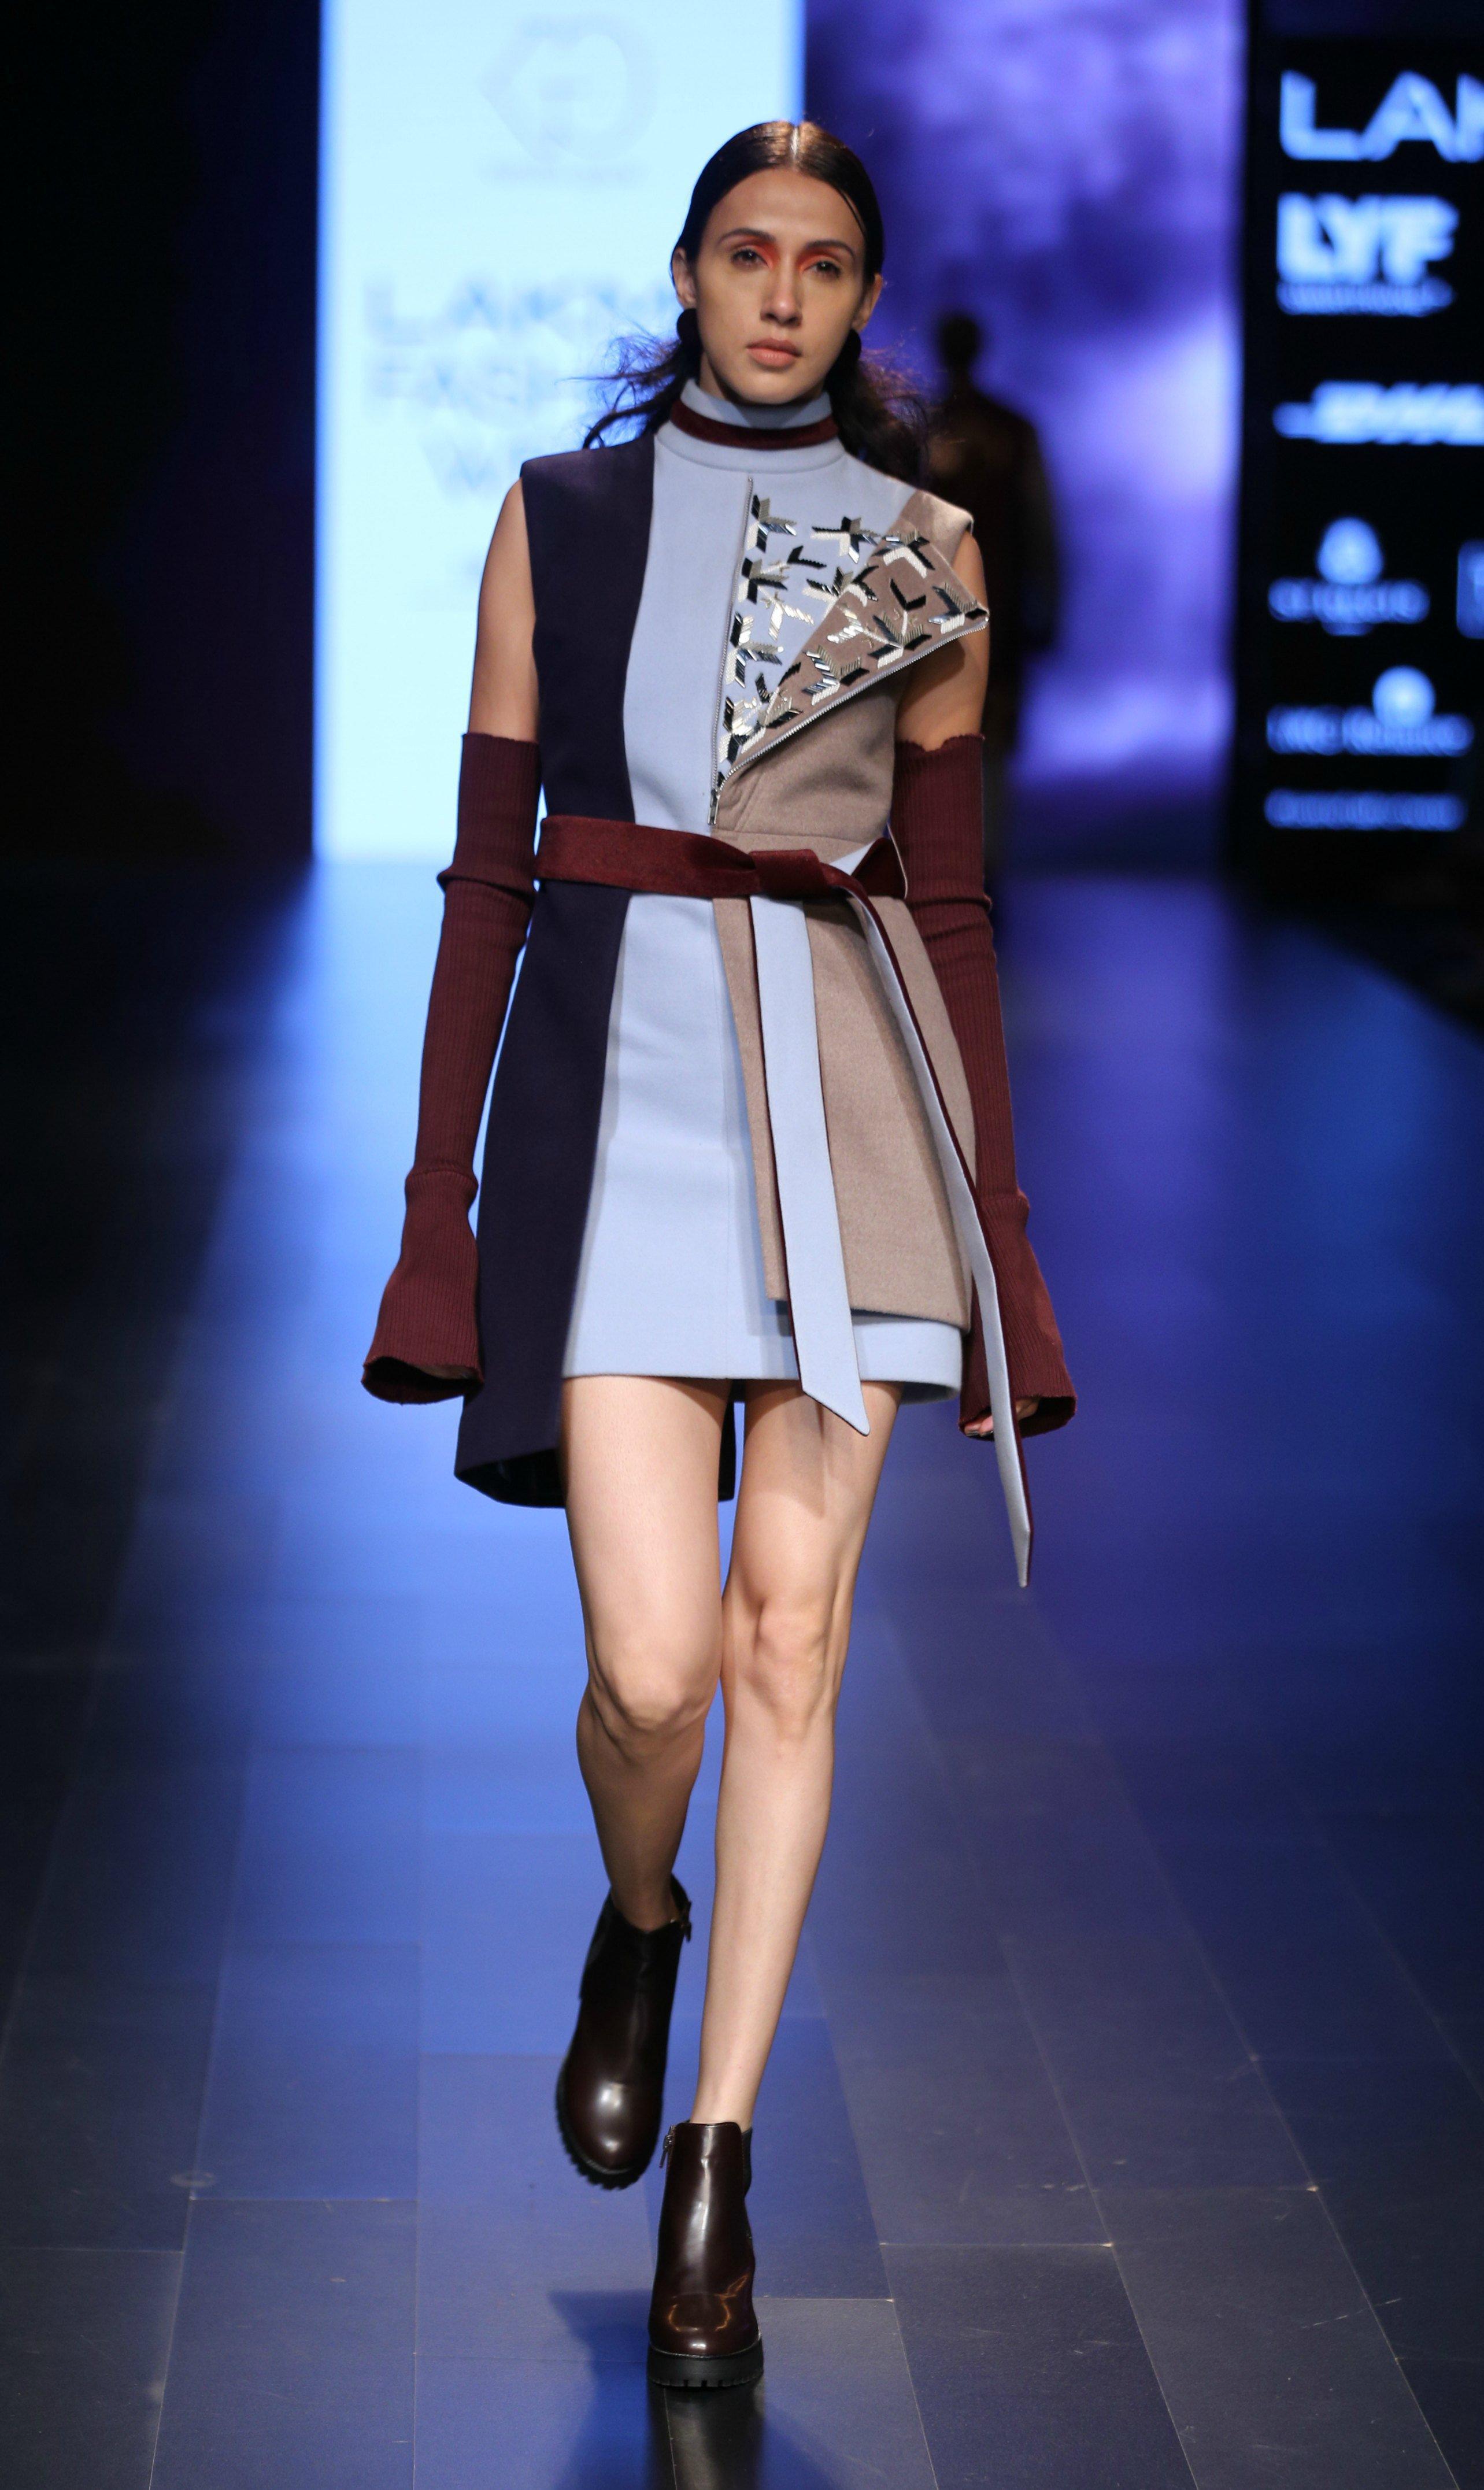 Phulkari for a Cause: Meet Kanika Goyal, the Designer Who ...